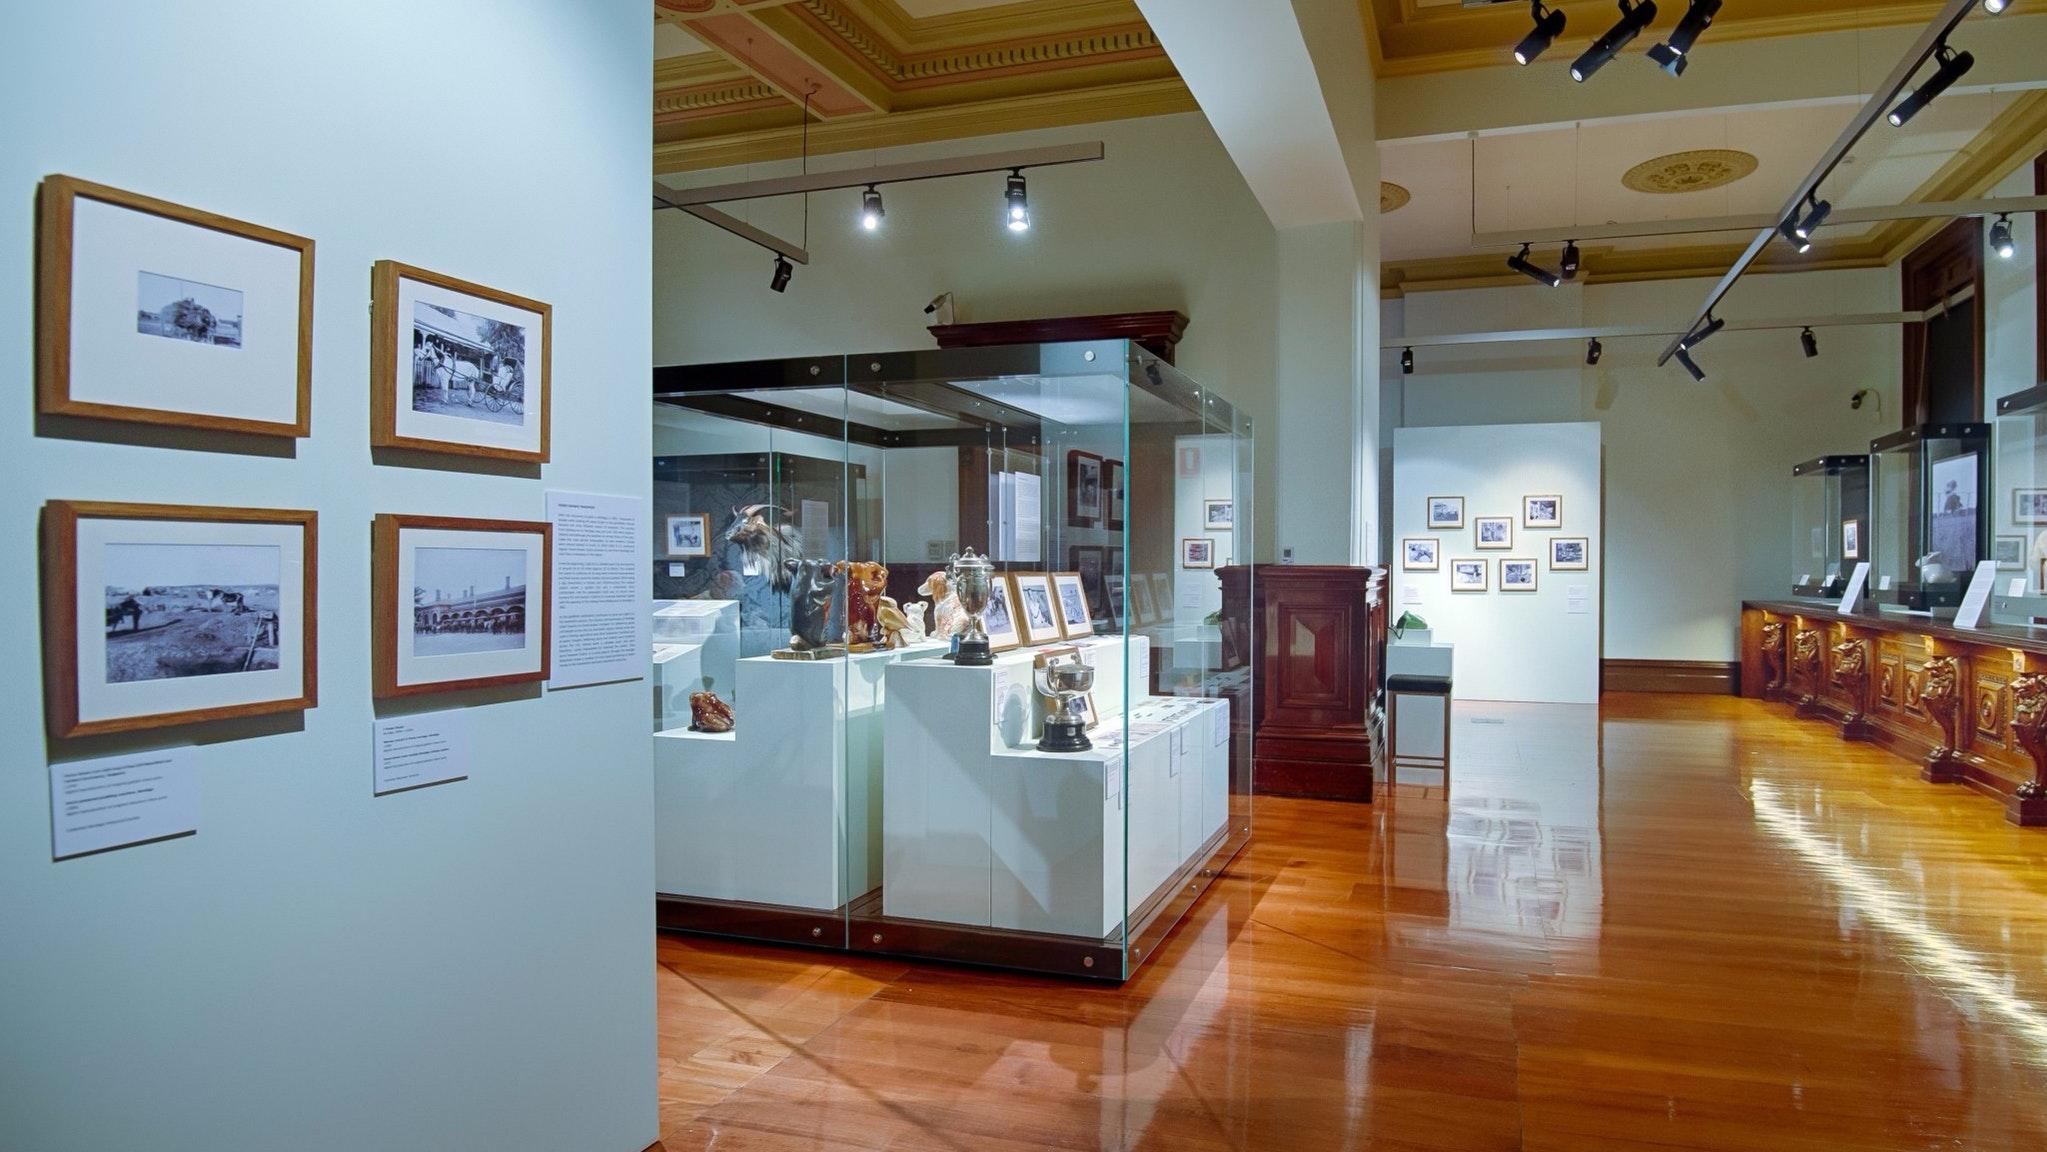 Bendigo Art Gallery Post Office Gallery in the Bendigo Historic Post Office Pall Mall